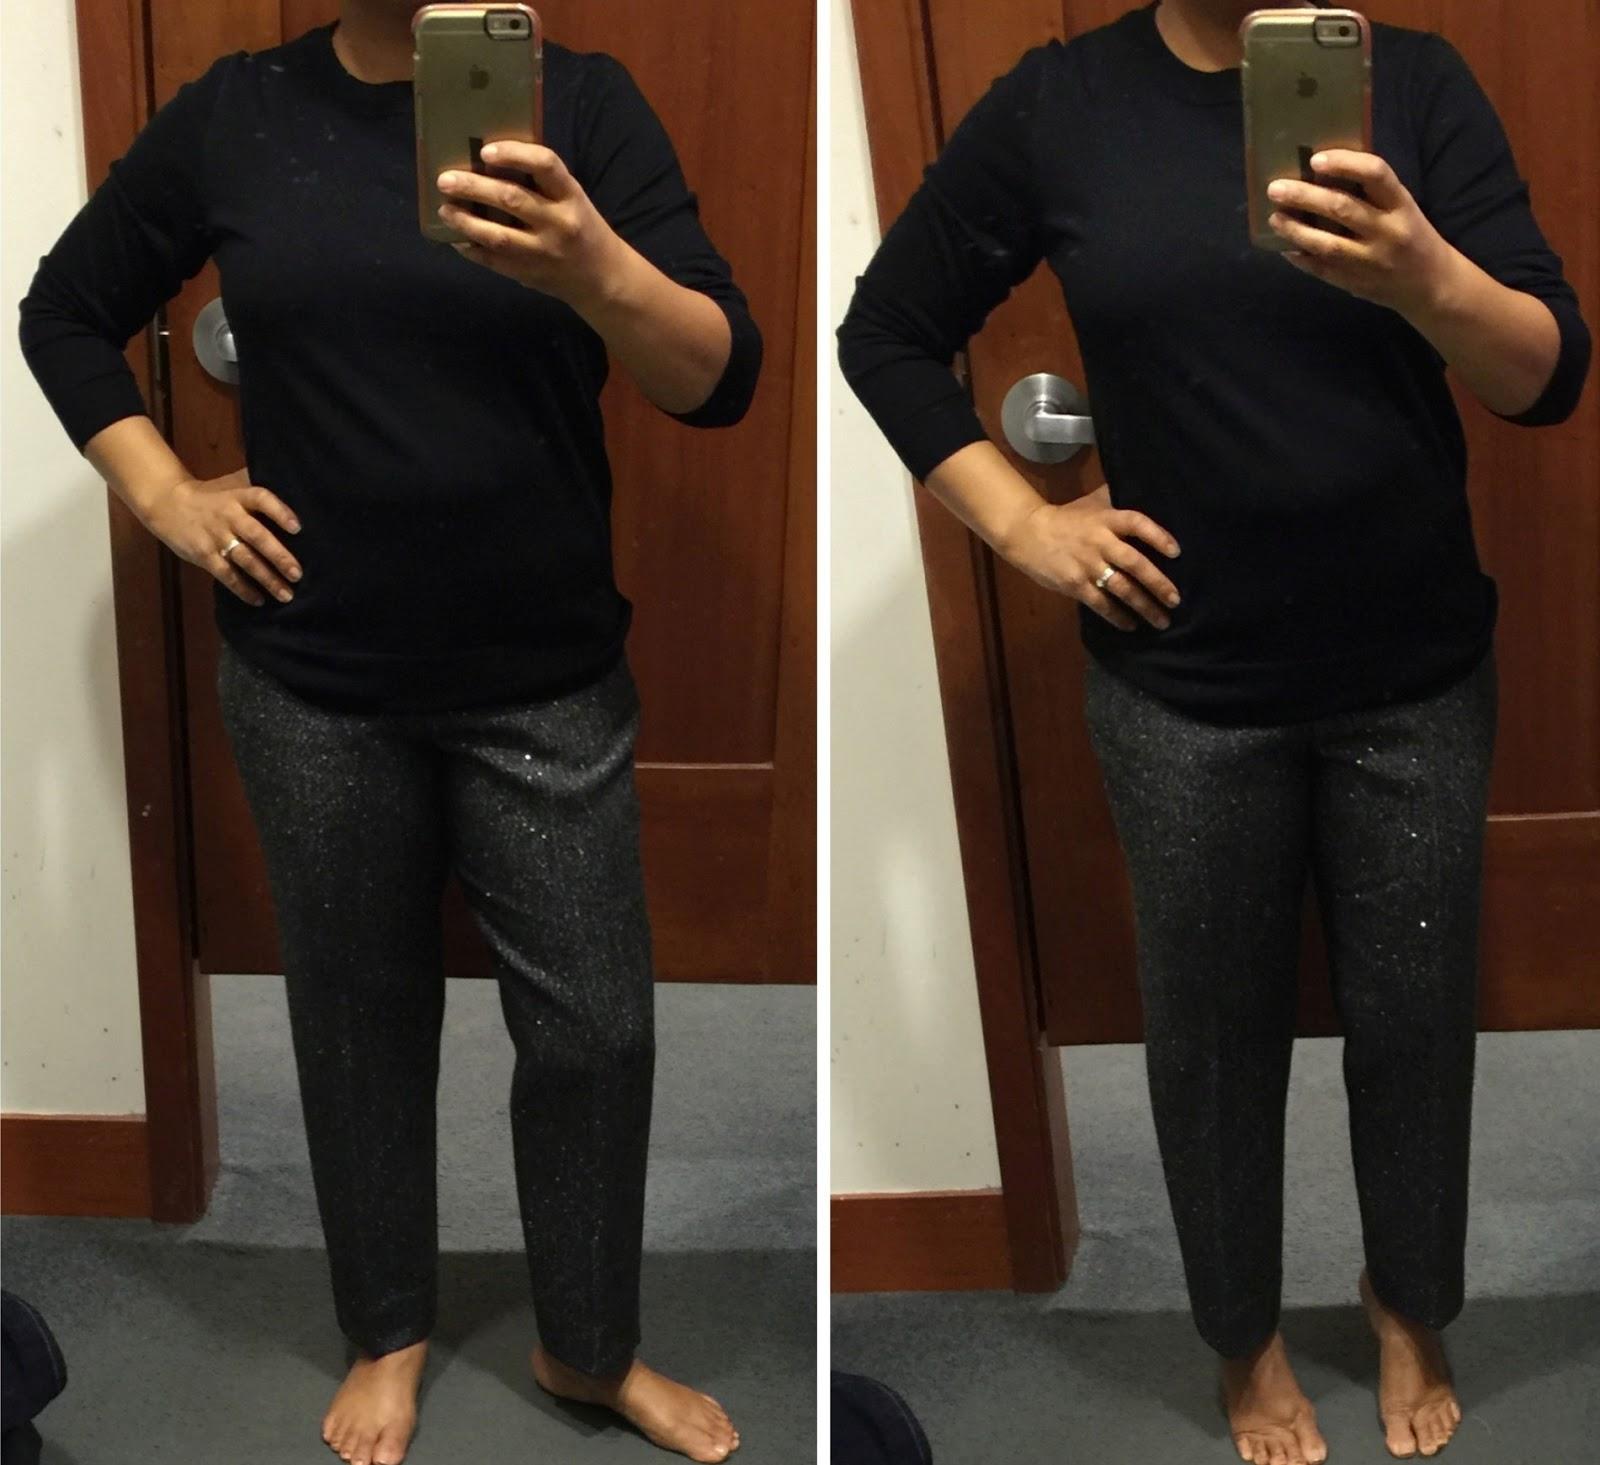 77b1728d54a1 Gigi's Gone Shopping |Fashion Blogger| J Crew Reviews|Style